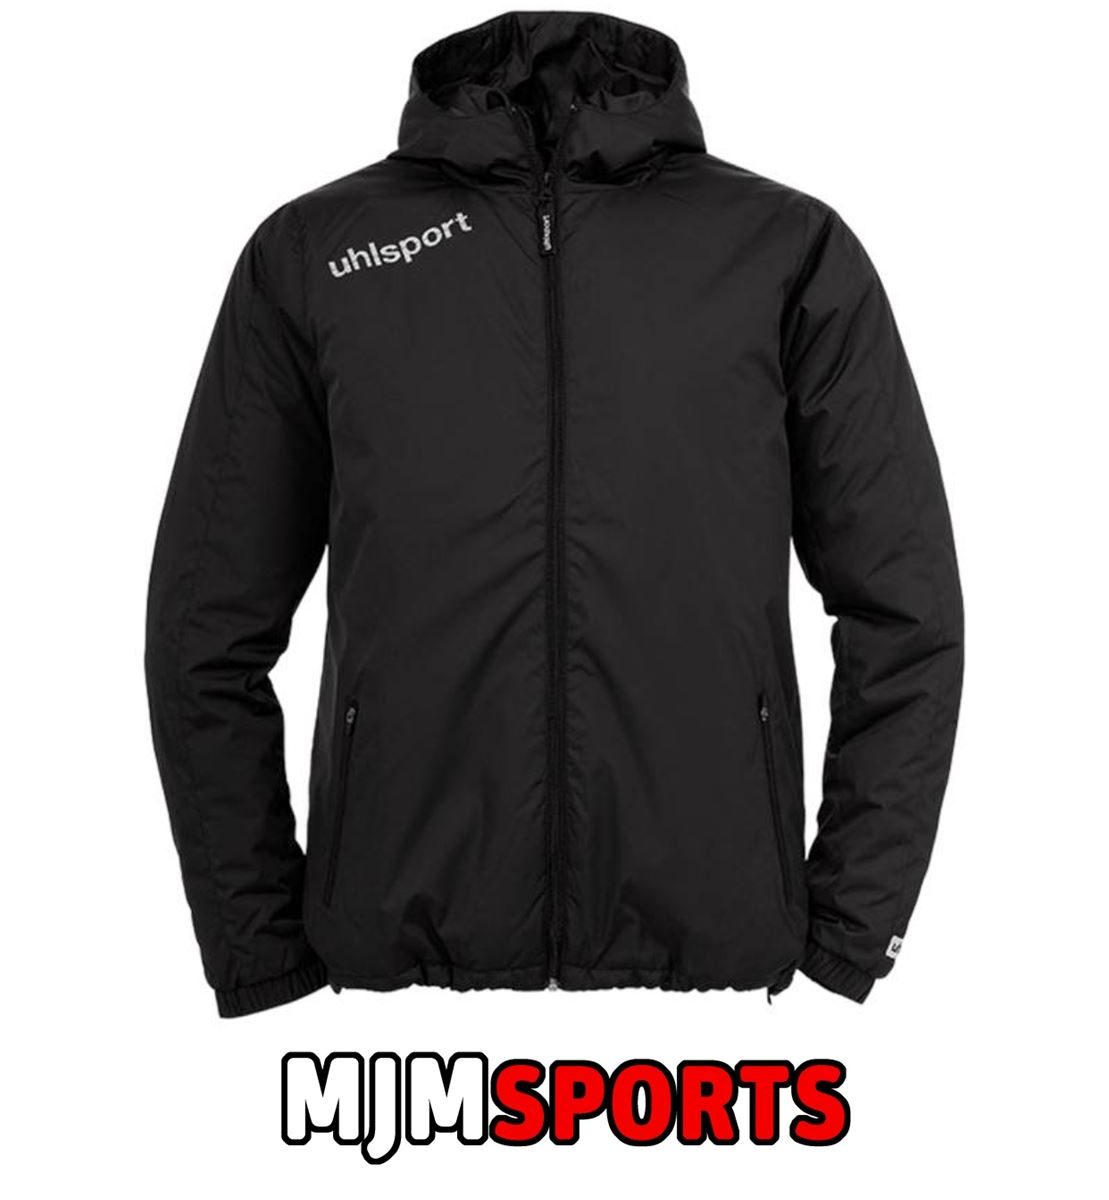 Uhlsport Essential Team Jacket 1003258